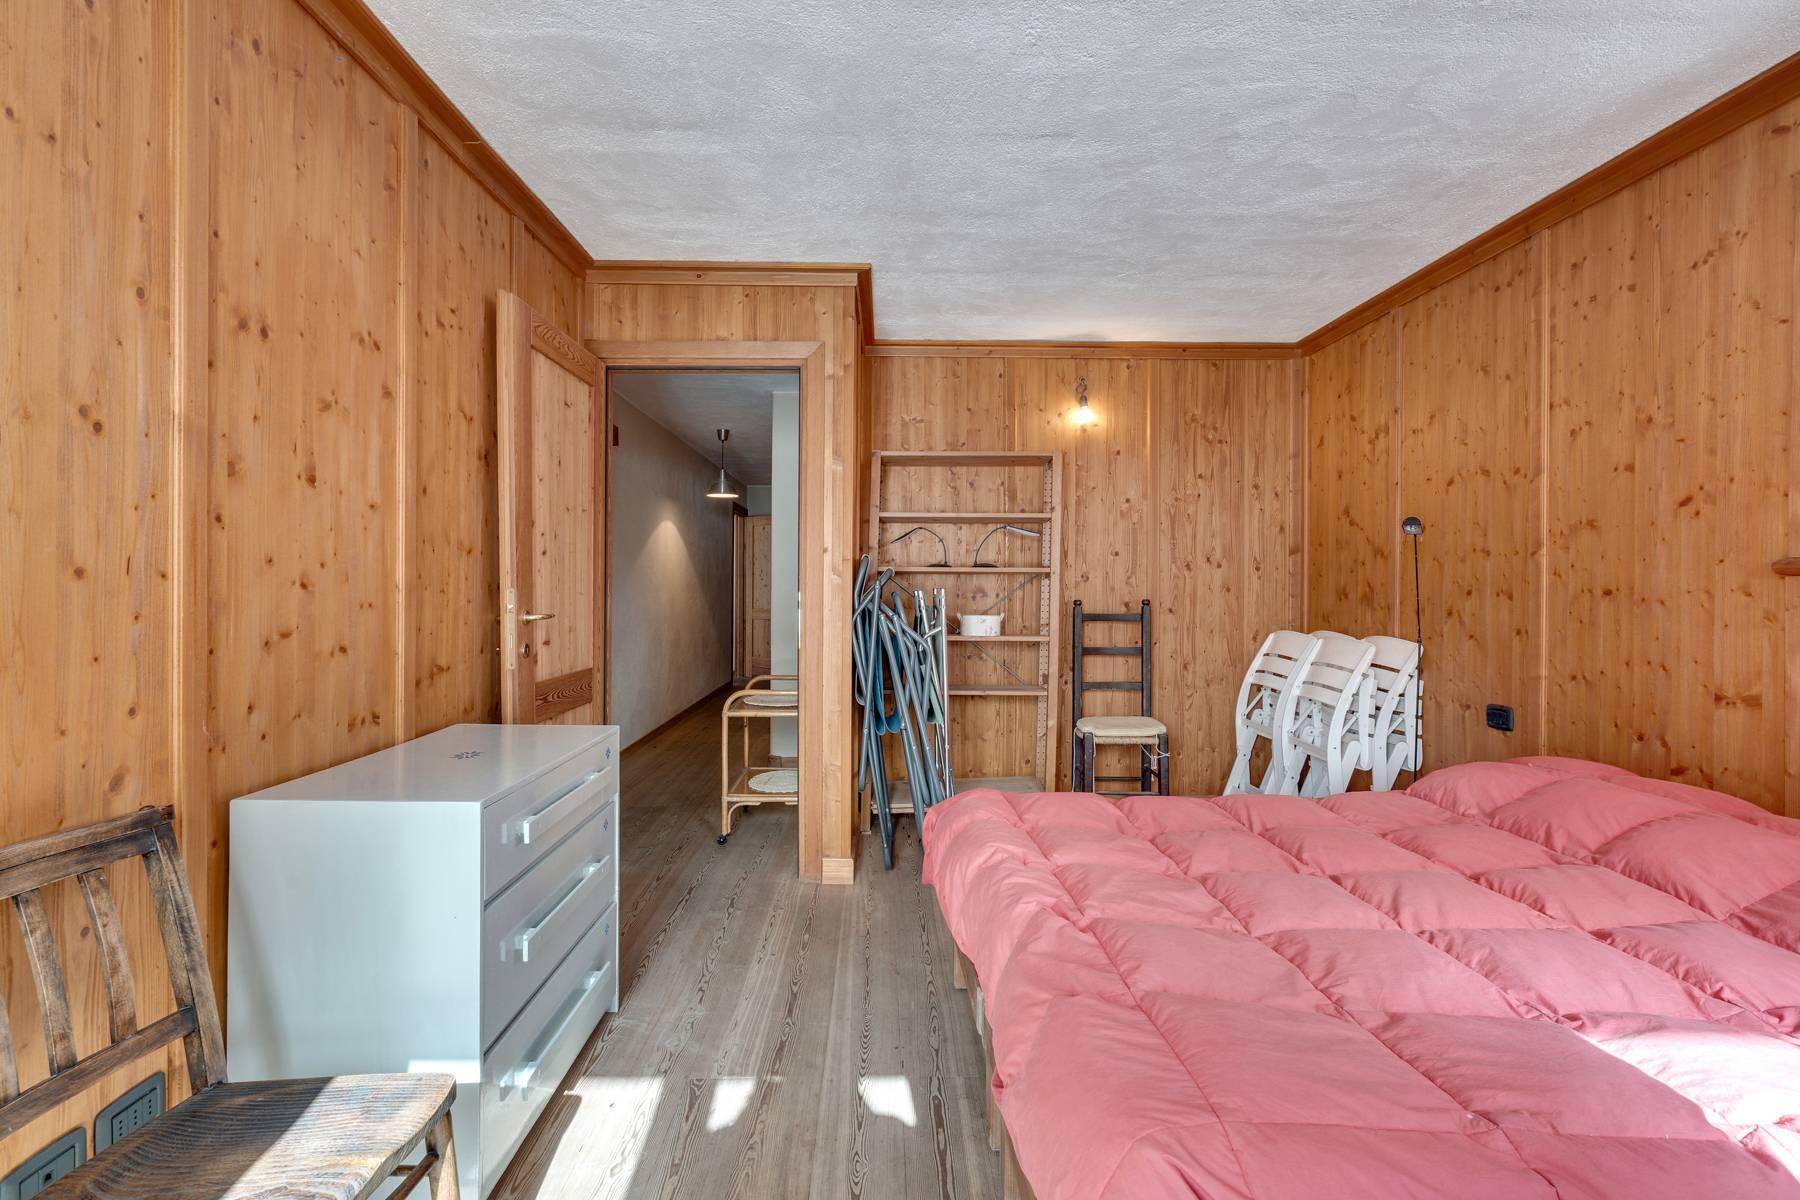 Villa in Vendita a Cogne: 5 locali, 377 mq - Foto 9